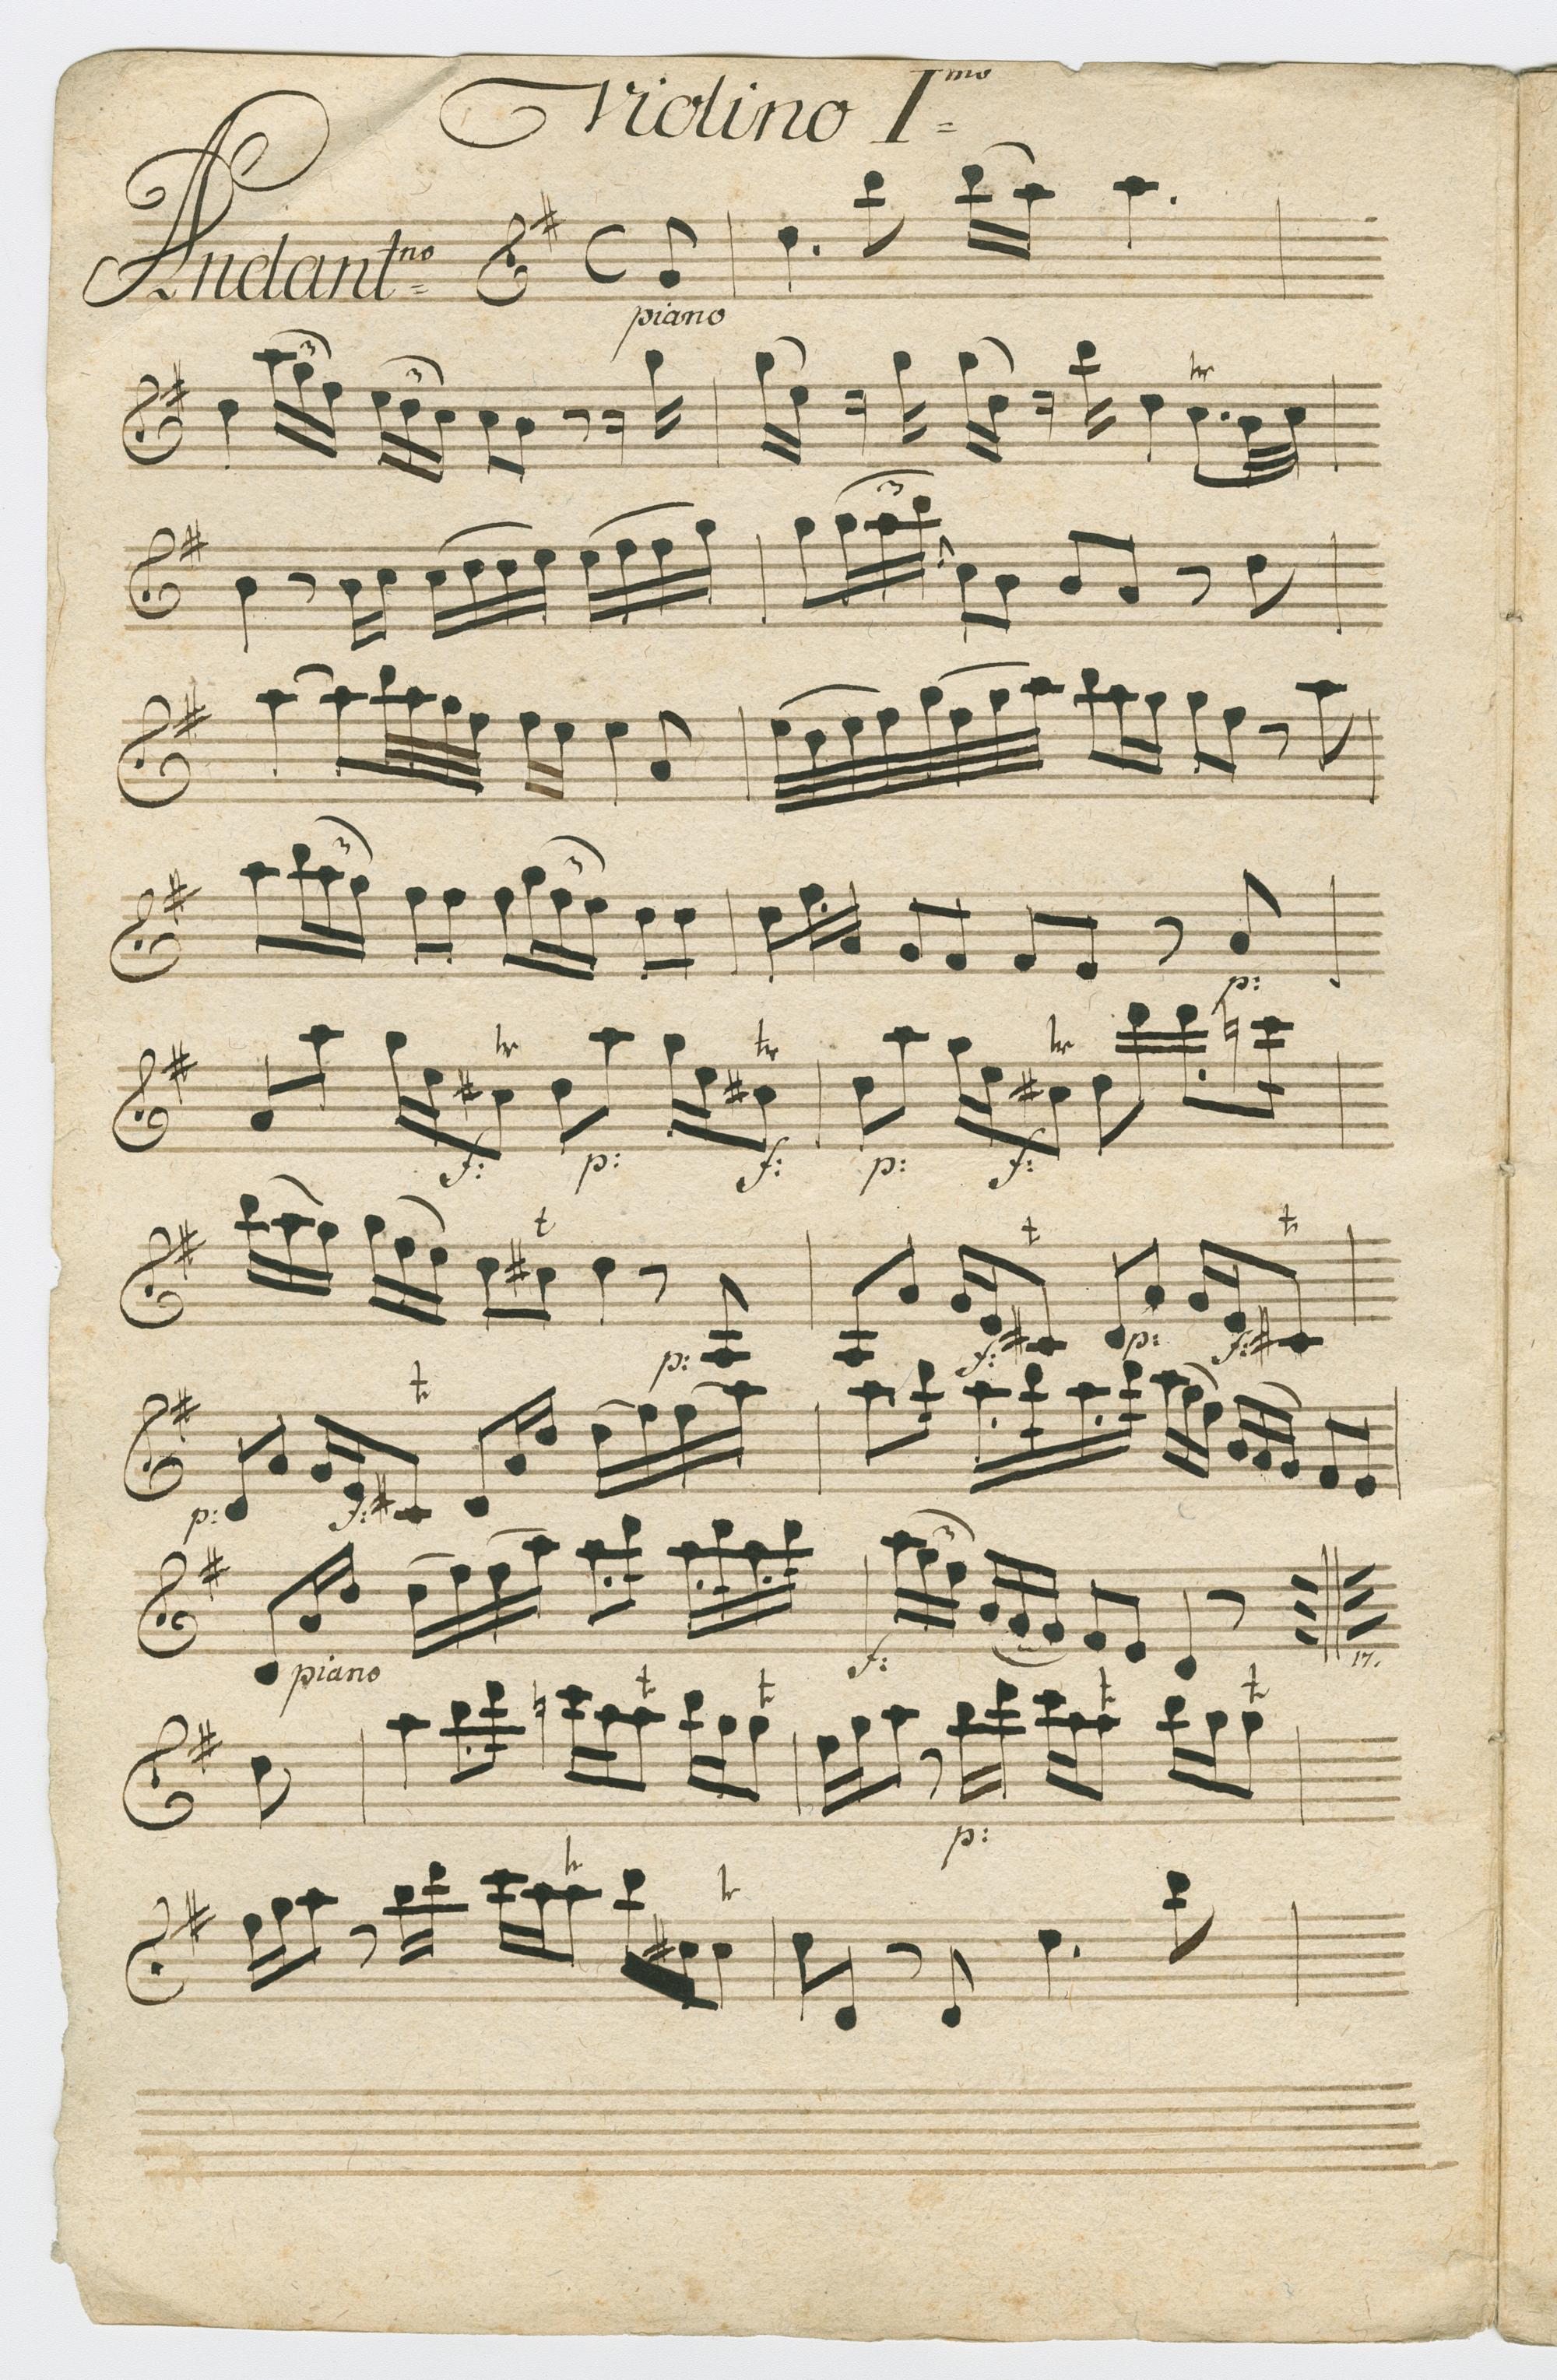 Amandus Ivanschiz, , Violino I (A-Wgm, XIII                   1325)